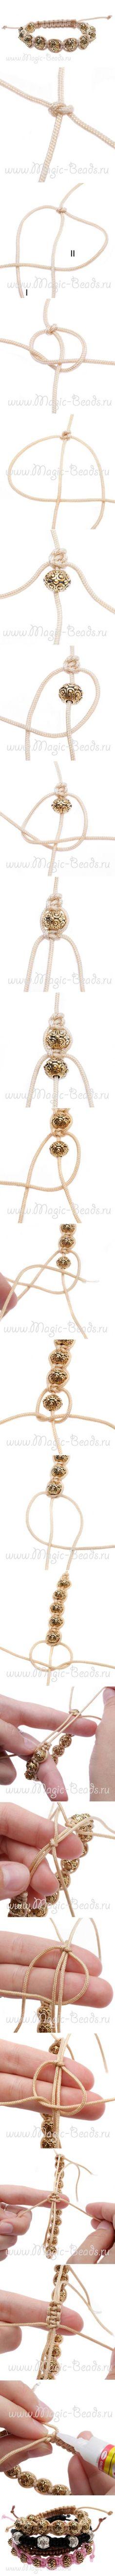 DIY Shambhala Bracelet DIY Shambhala Bracelet by diyforever